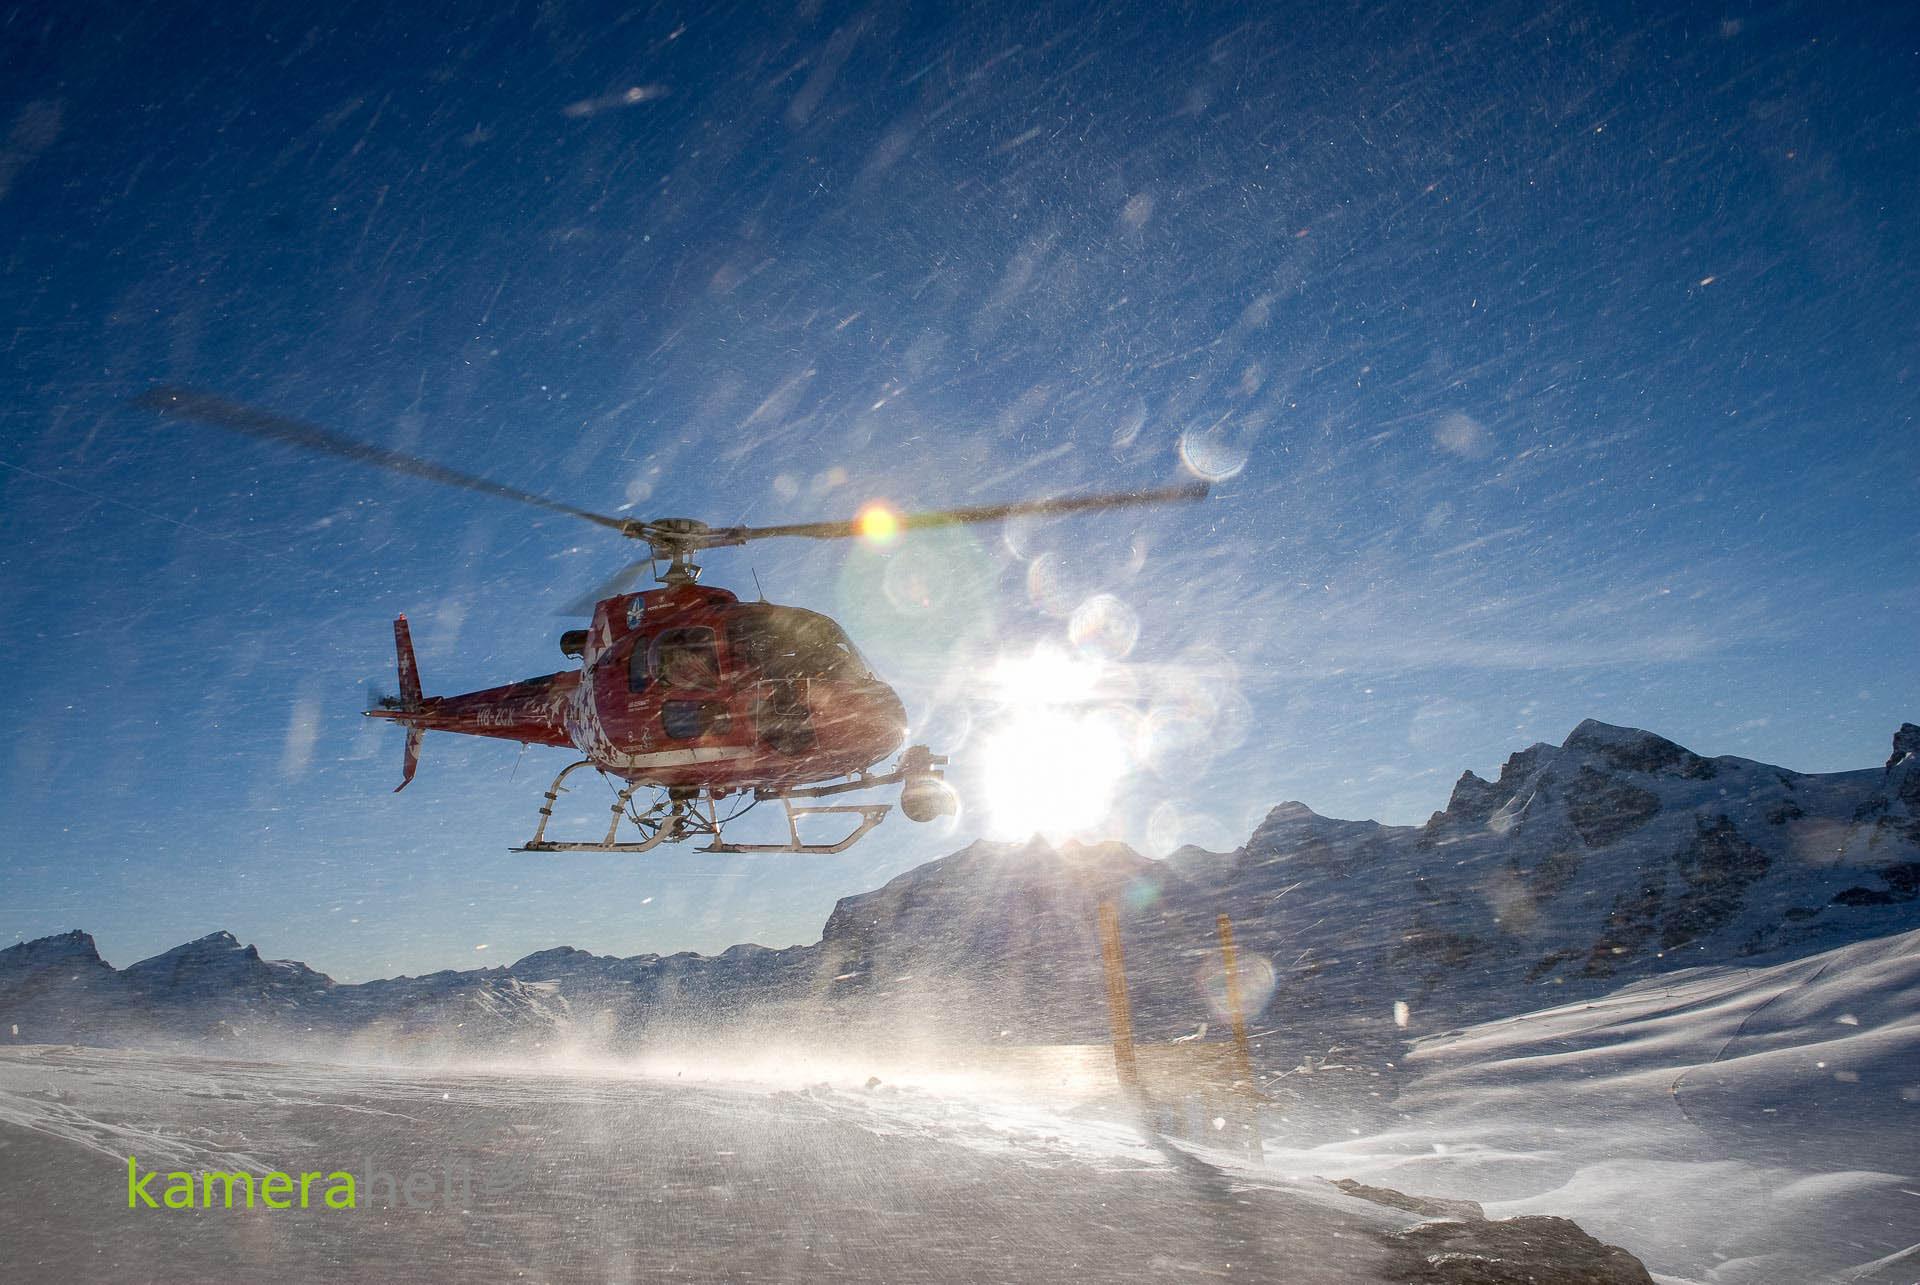 kameraheli @ Zermatt